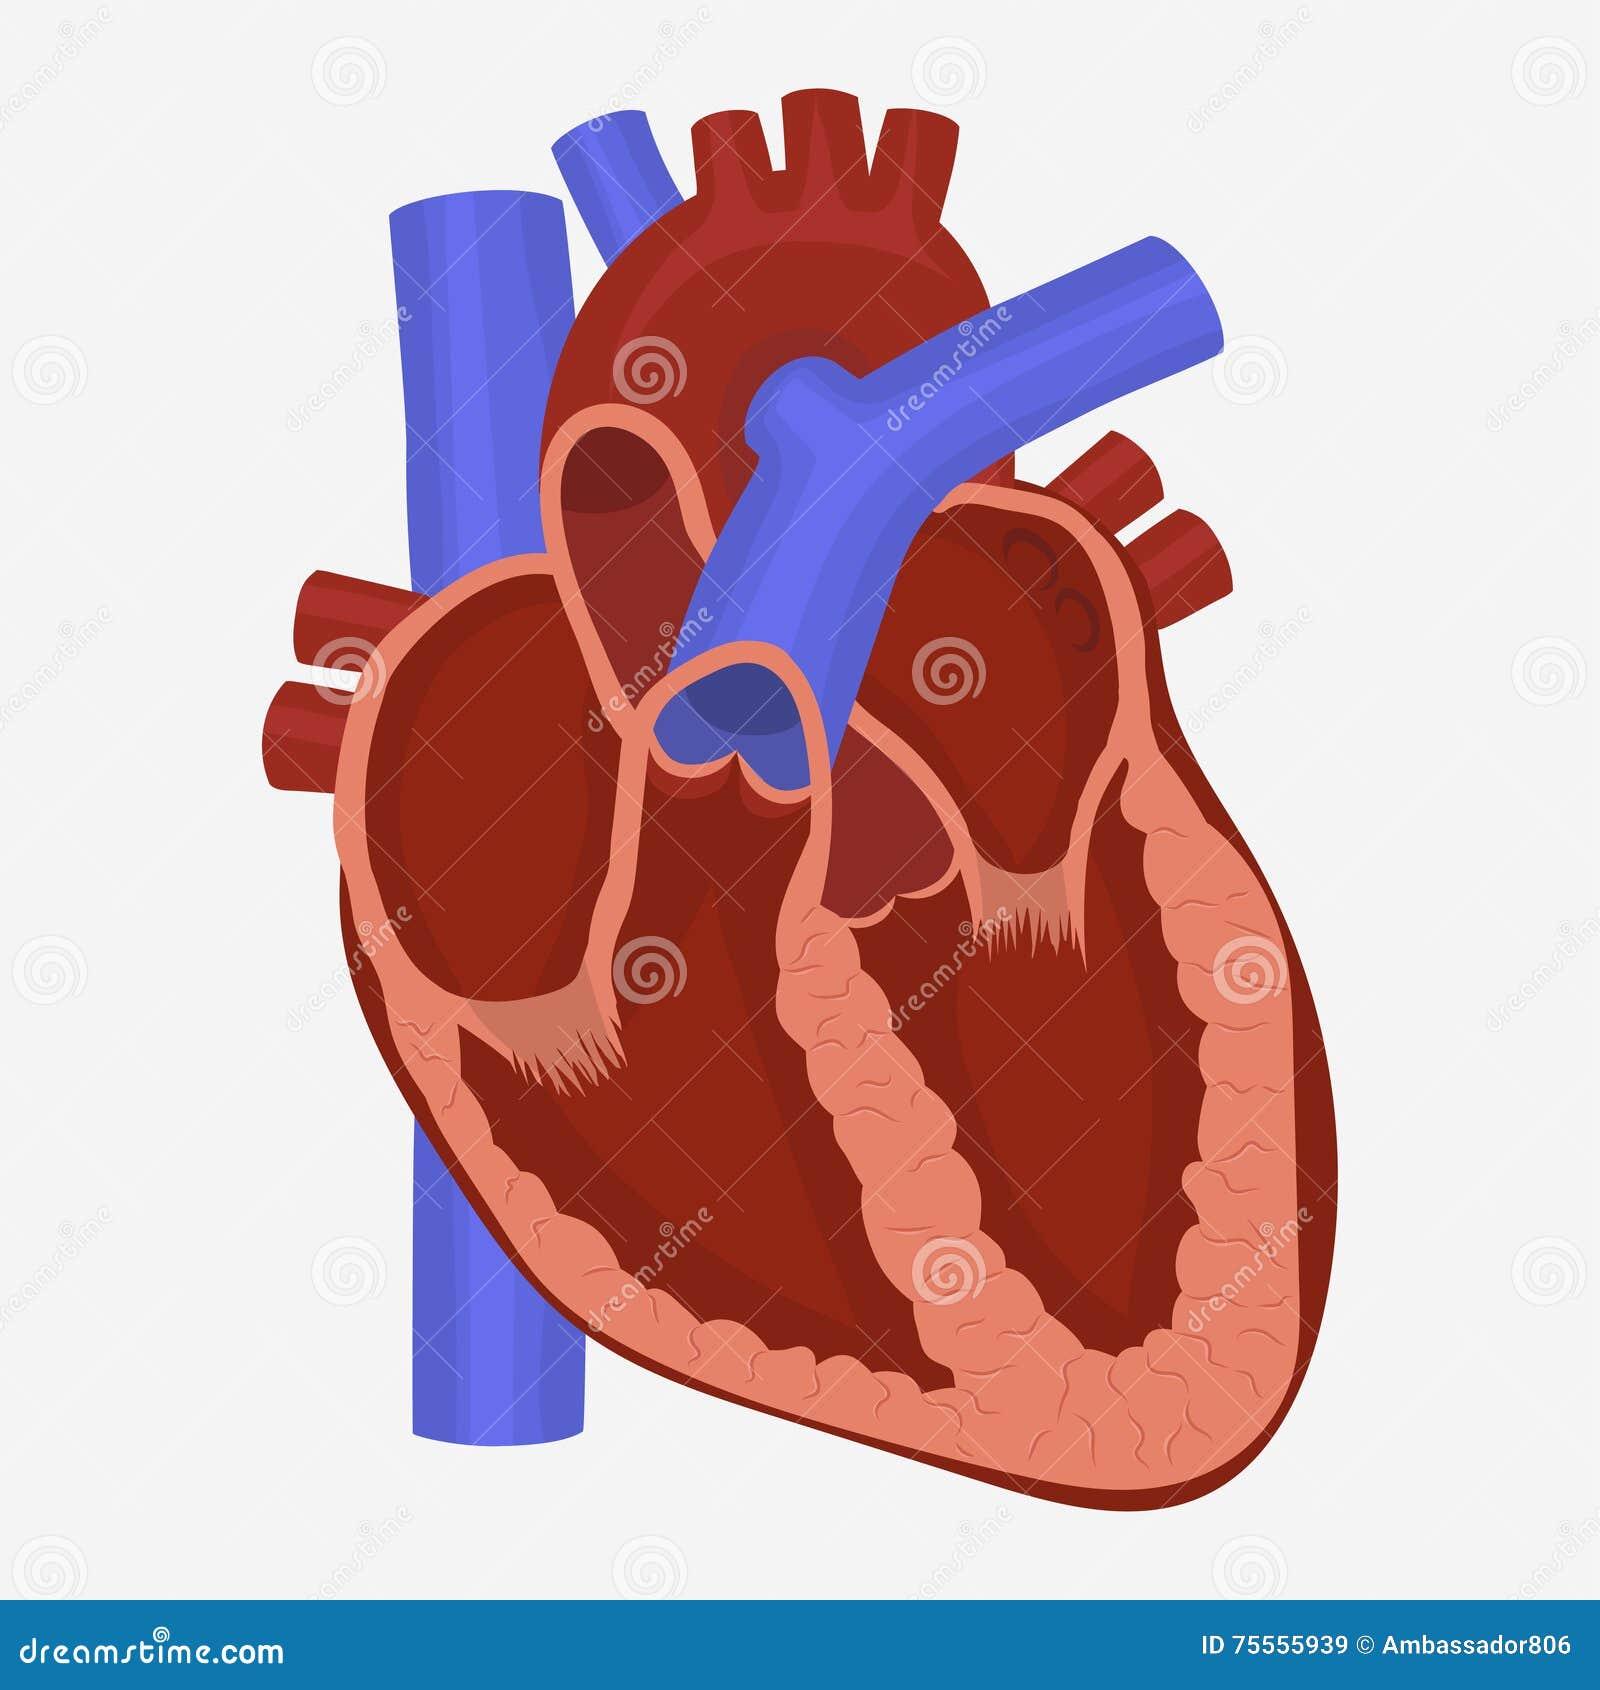 Heart Anatomy Vector Stock Vector Illustration Of Illustration